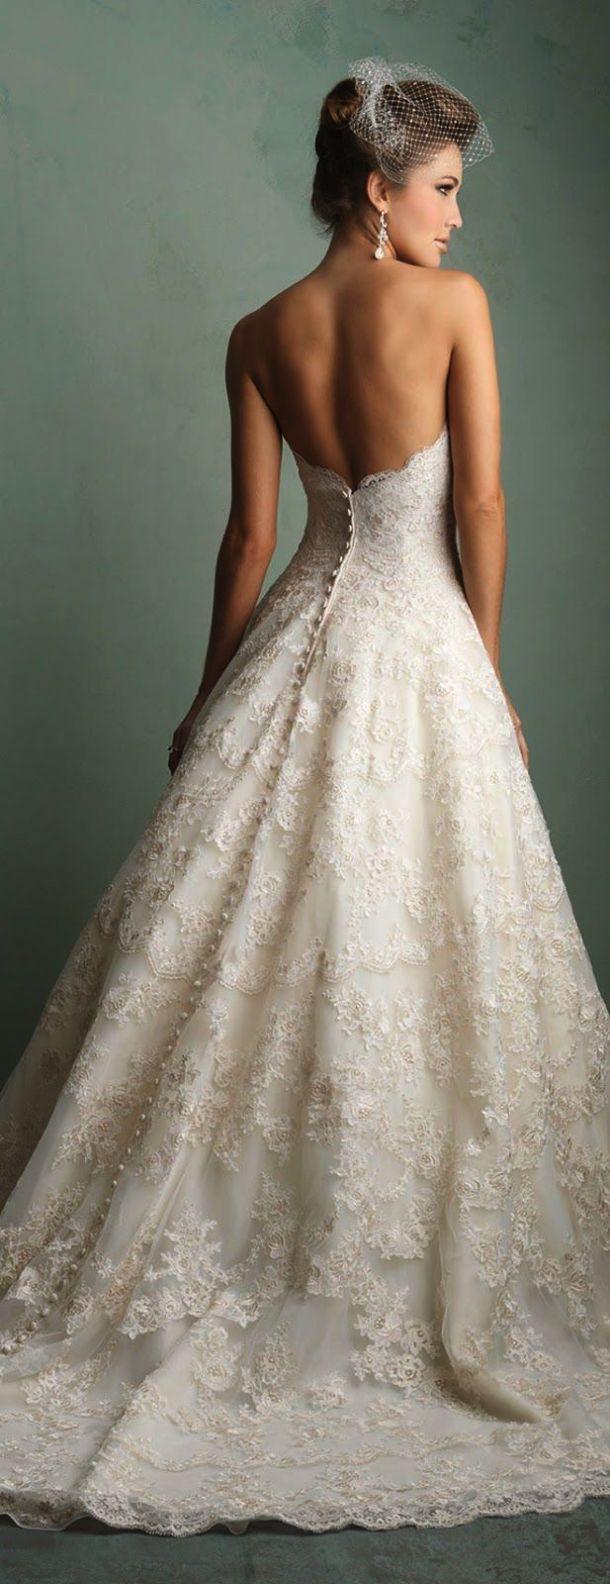 Wonderful lace mermaid wedding dress with cap sleeves